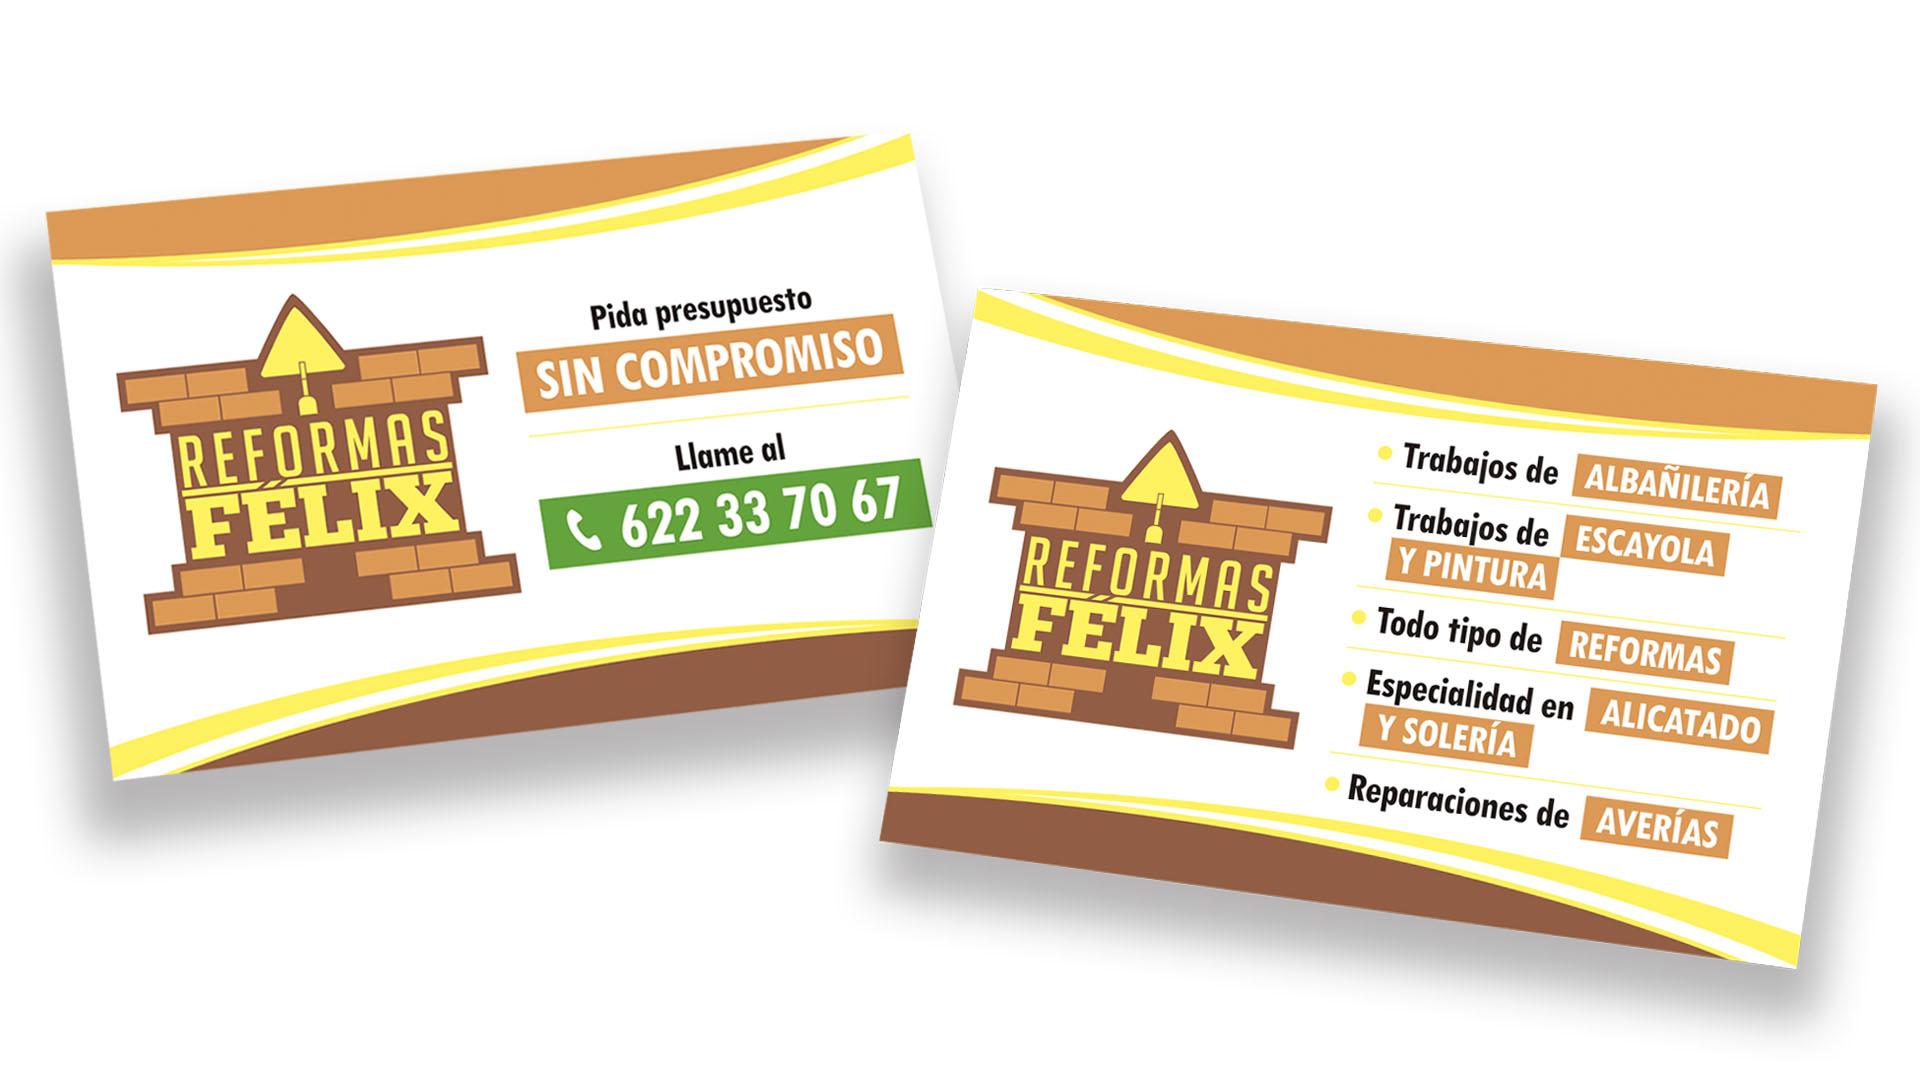 REFORMAS FÉLIX - Tarjeta